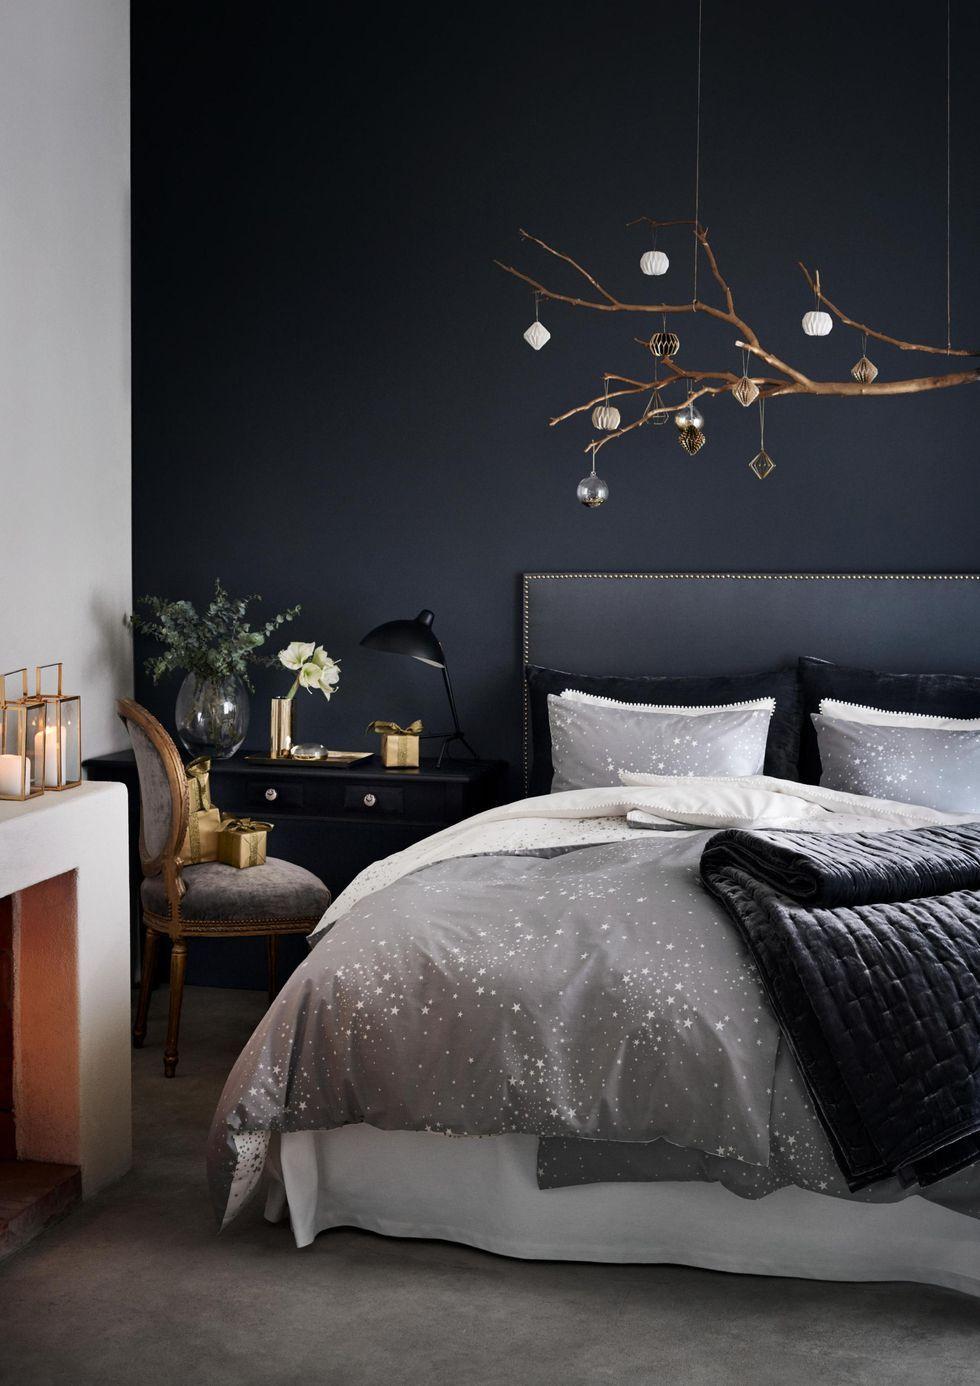 Chambre mur bleu nuit HM2 | Chambres - Bedroom I ♡ | Pinterest ...